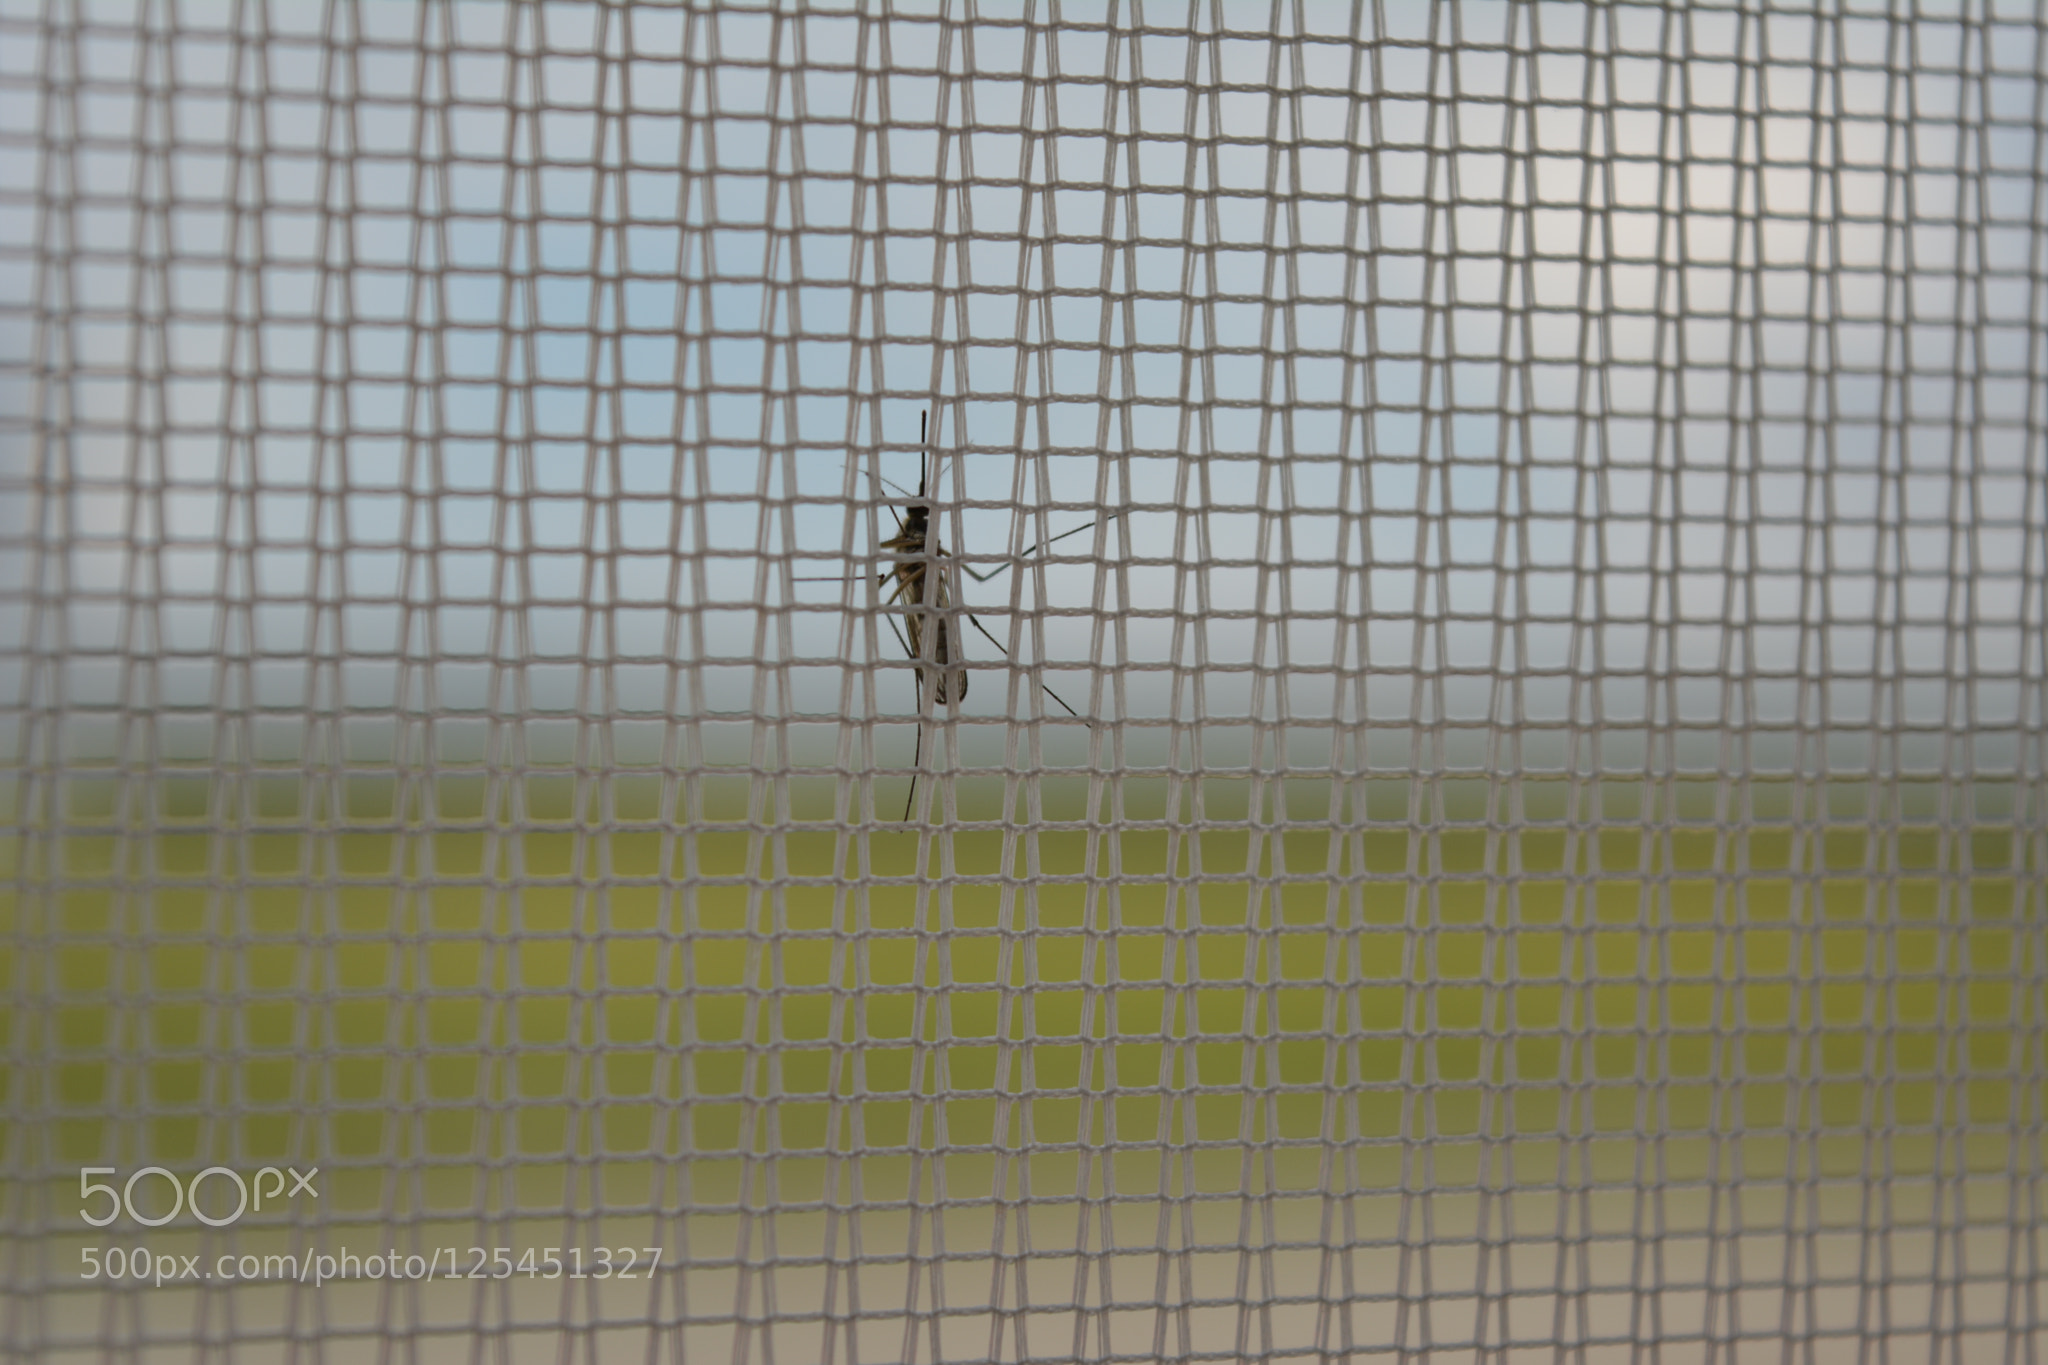 mosquito on net